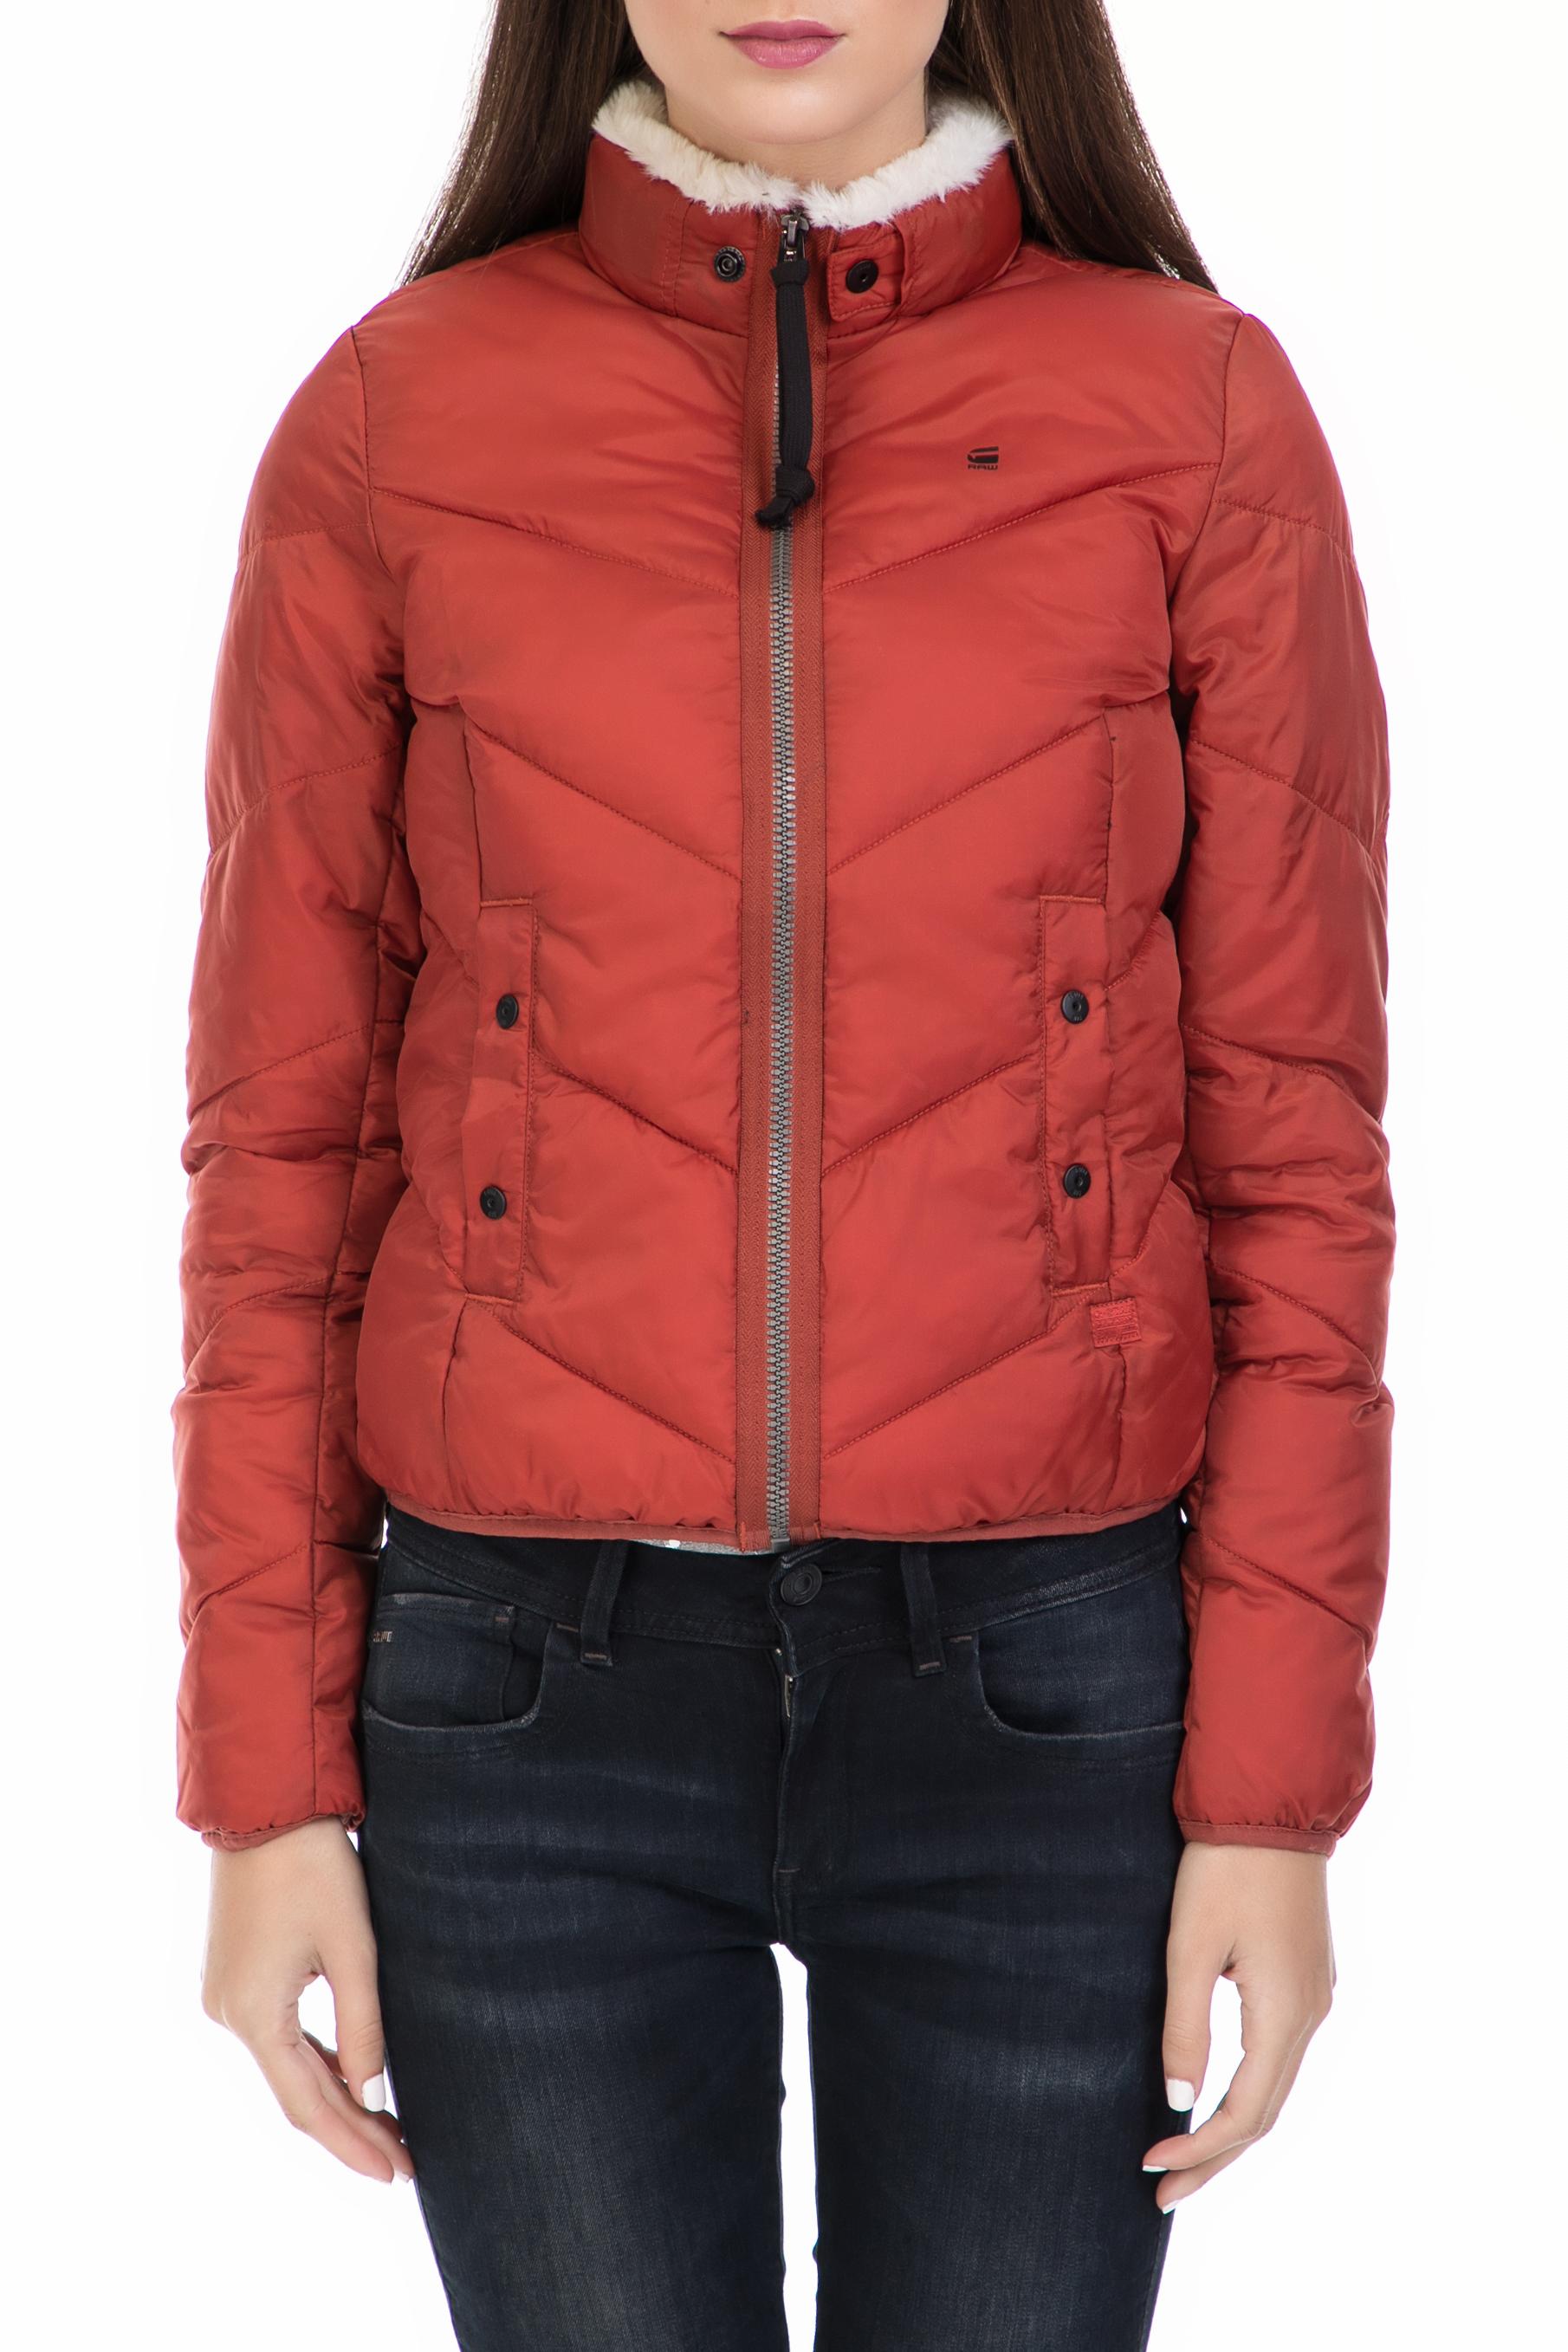 G-STAR – Γυναικείο μπουφάν G-STAR RAW κόκκινο 74c6f44f0d3